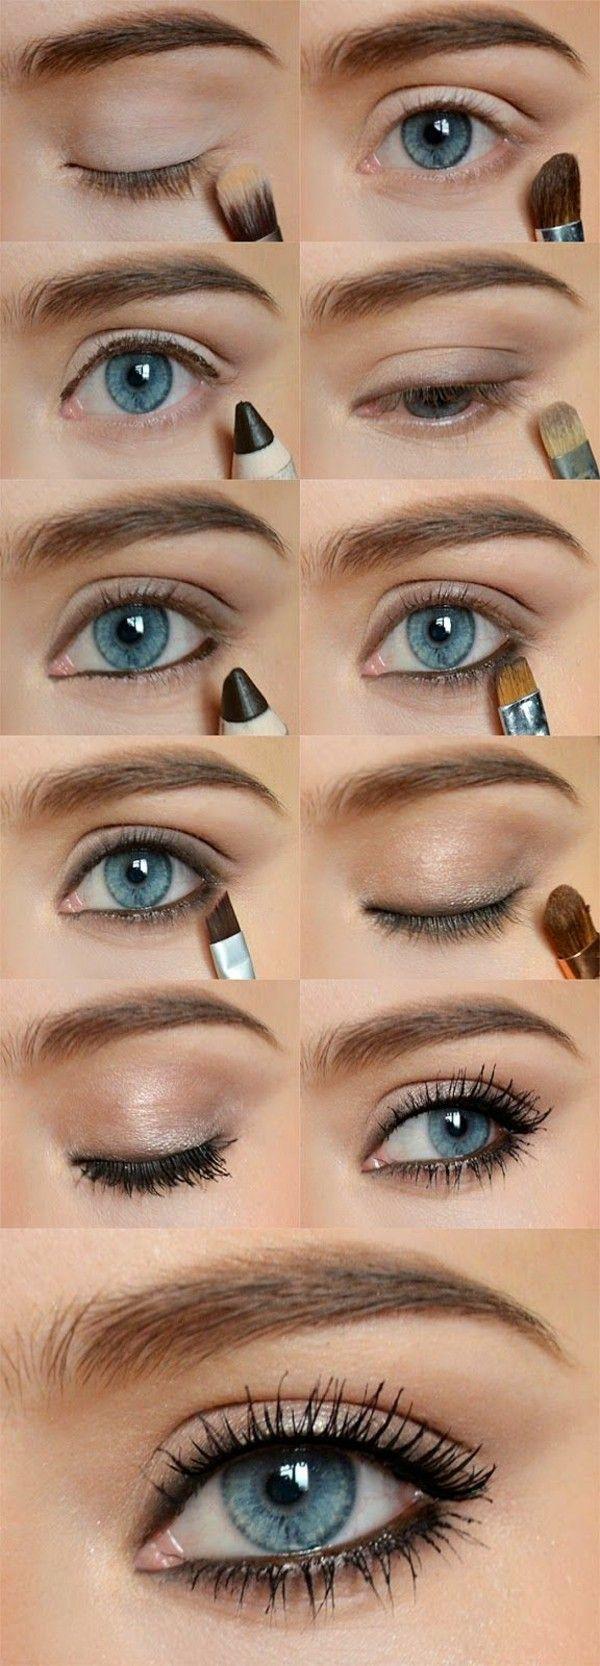 Best 25+ Applying Eyeshadow Ideas On Pinterest  How To Eyeshadow, How To Apply  Eyeshadow And How To Use Eyeshadow